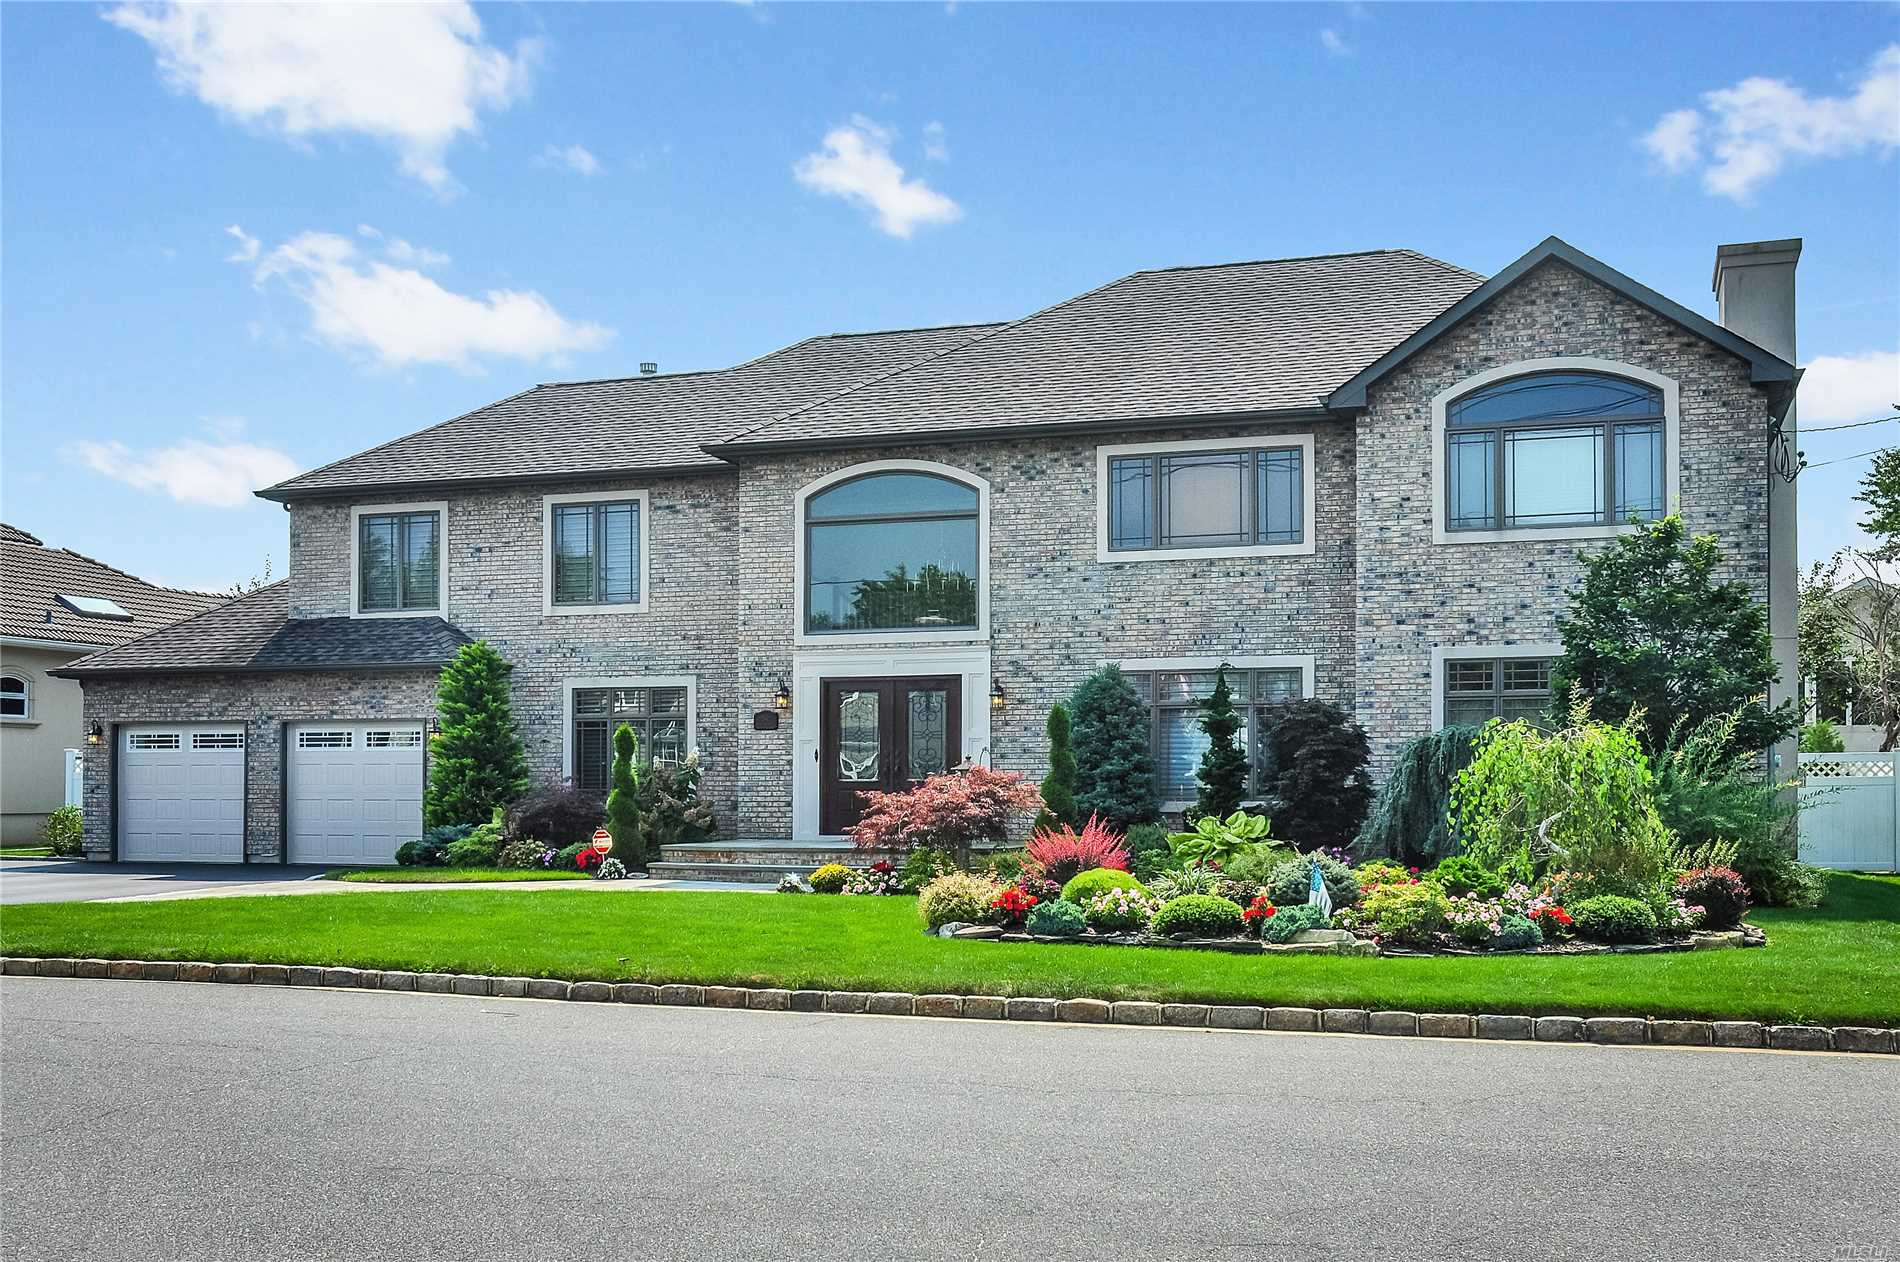 Photo of home for sale at 54 Lagoon Blvd, Massapequa NY